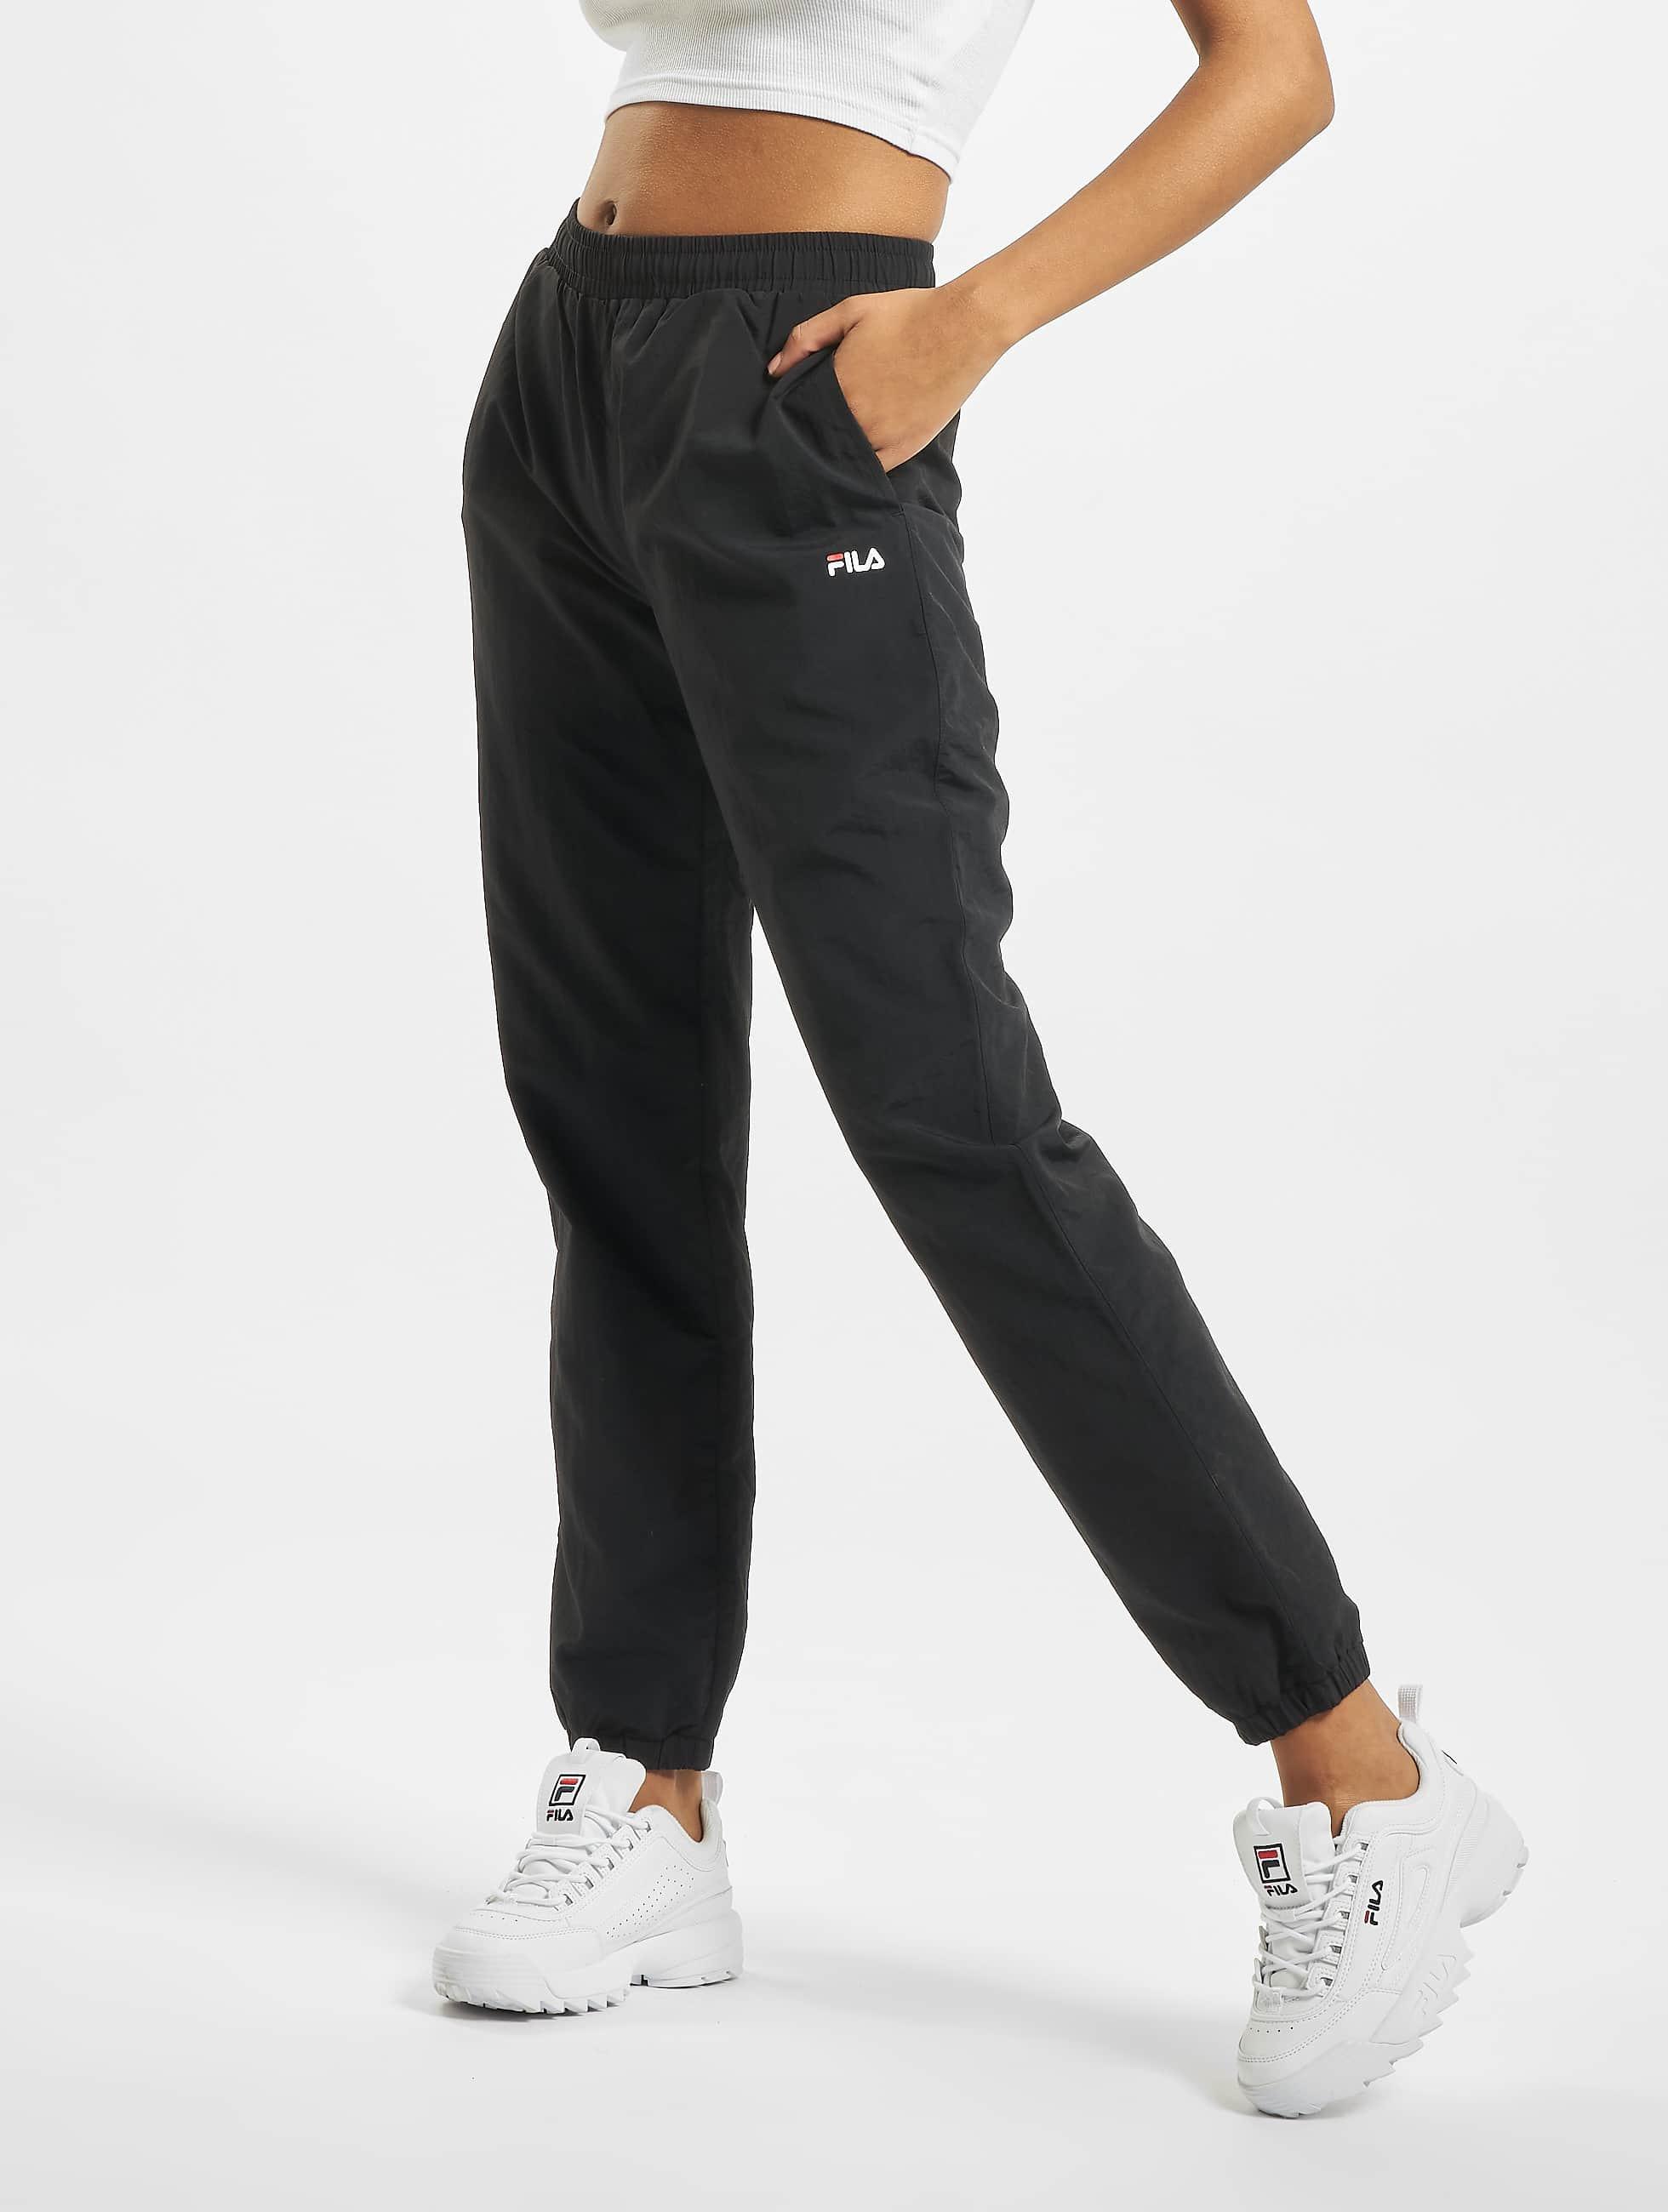 Fila Urban Line Alma Woven Pants Black